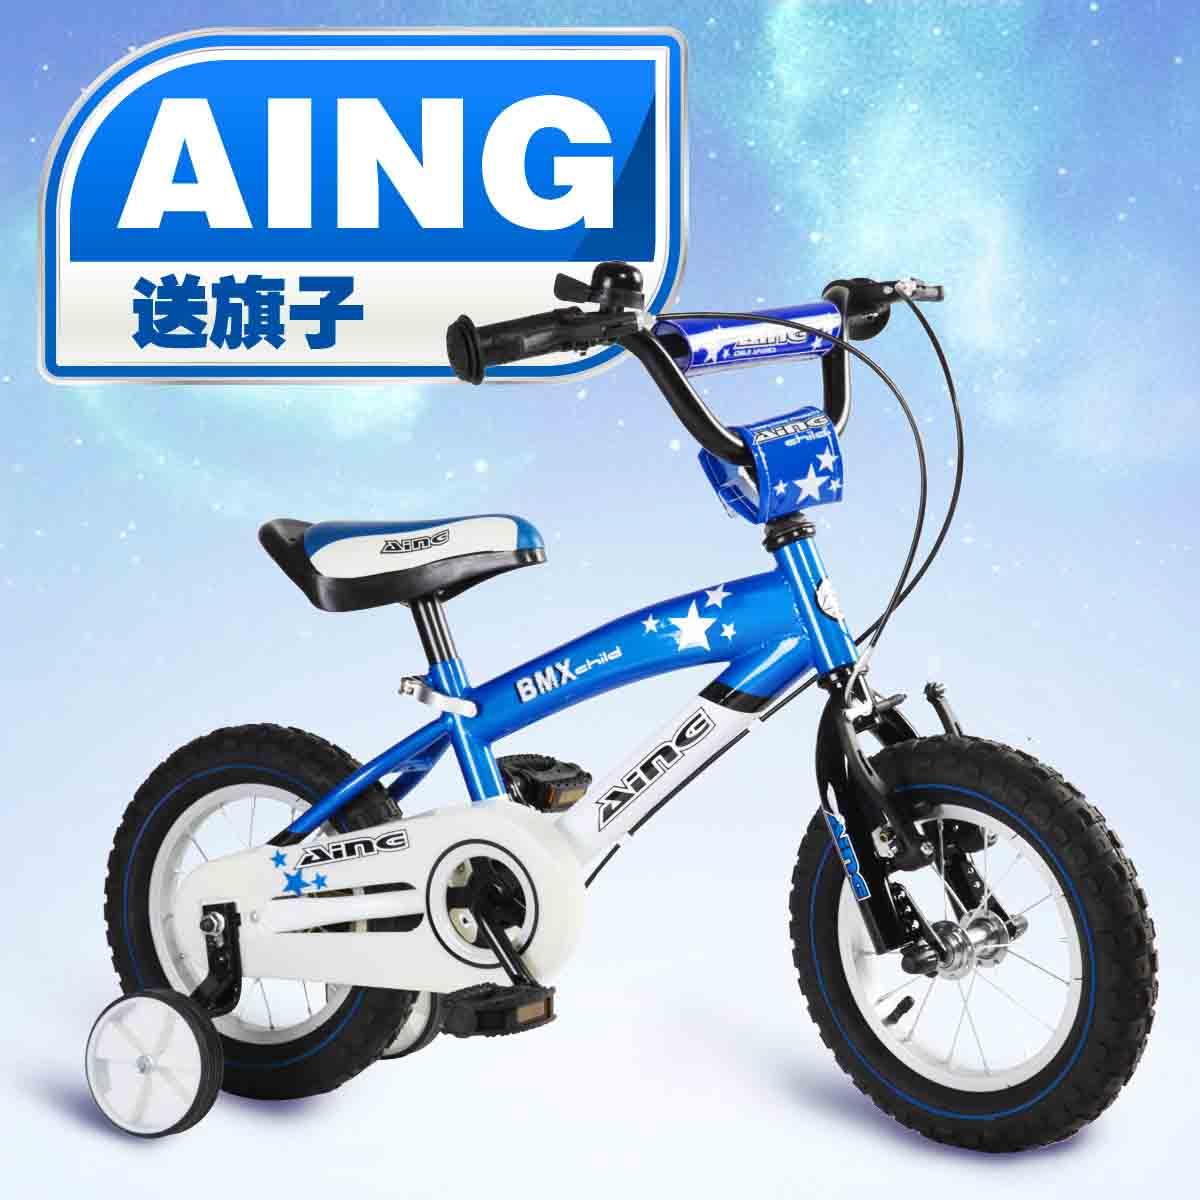 Детский велосипед The Aing  AING 12/14/16/18